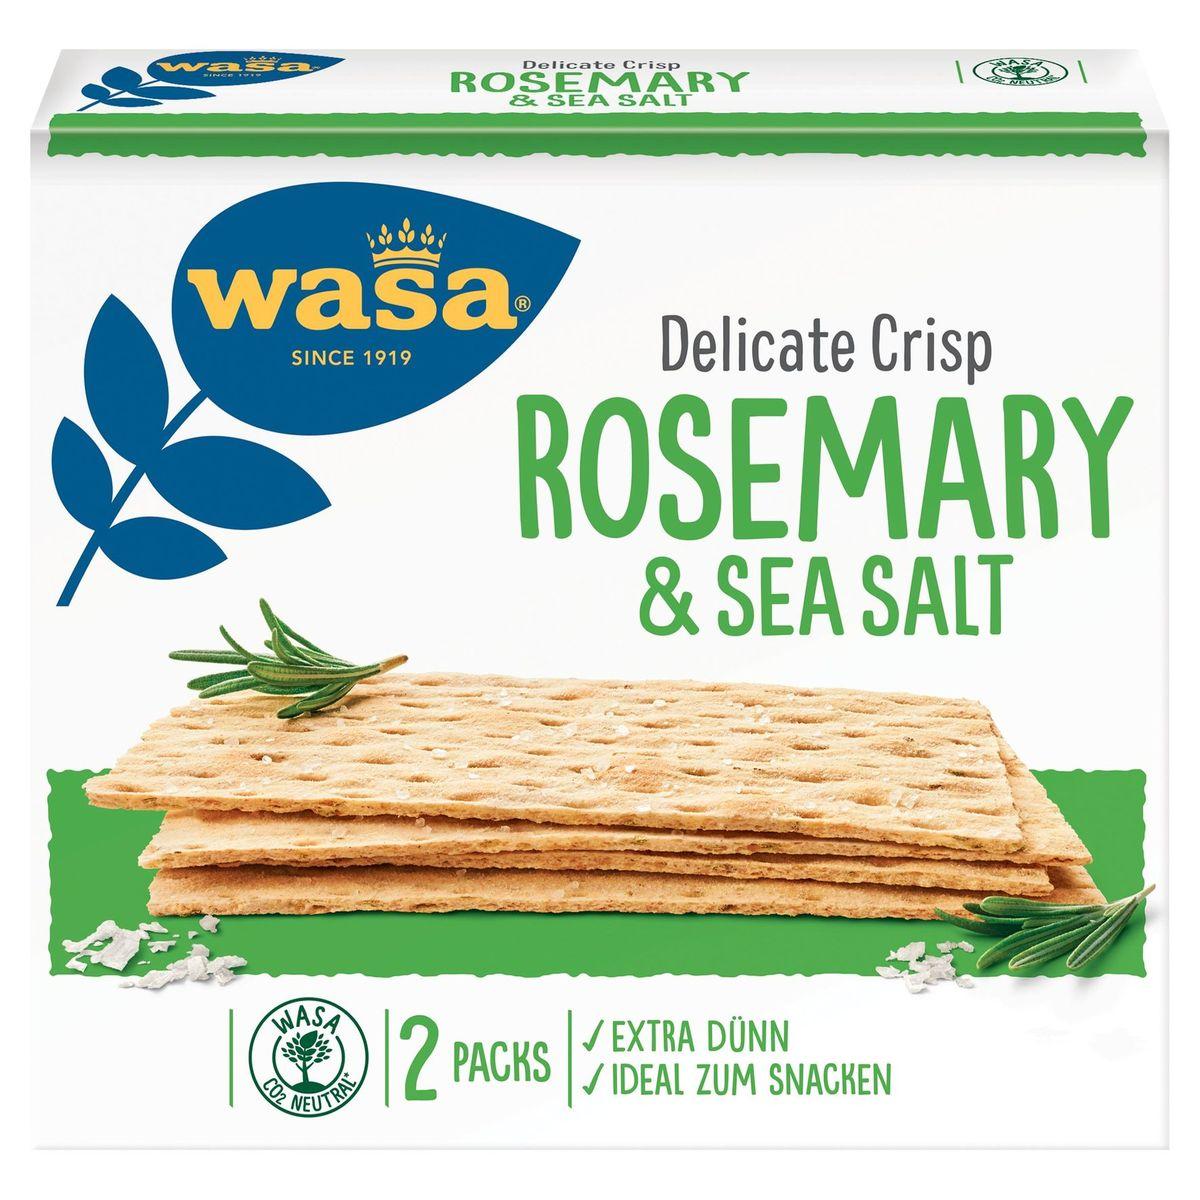 Wasa Delicate Crisp Rosemary & Sea Salt 190 g